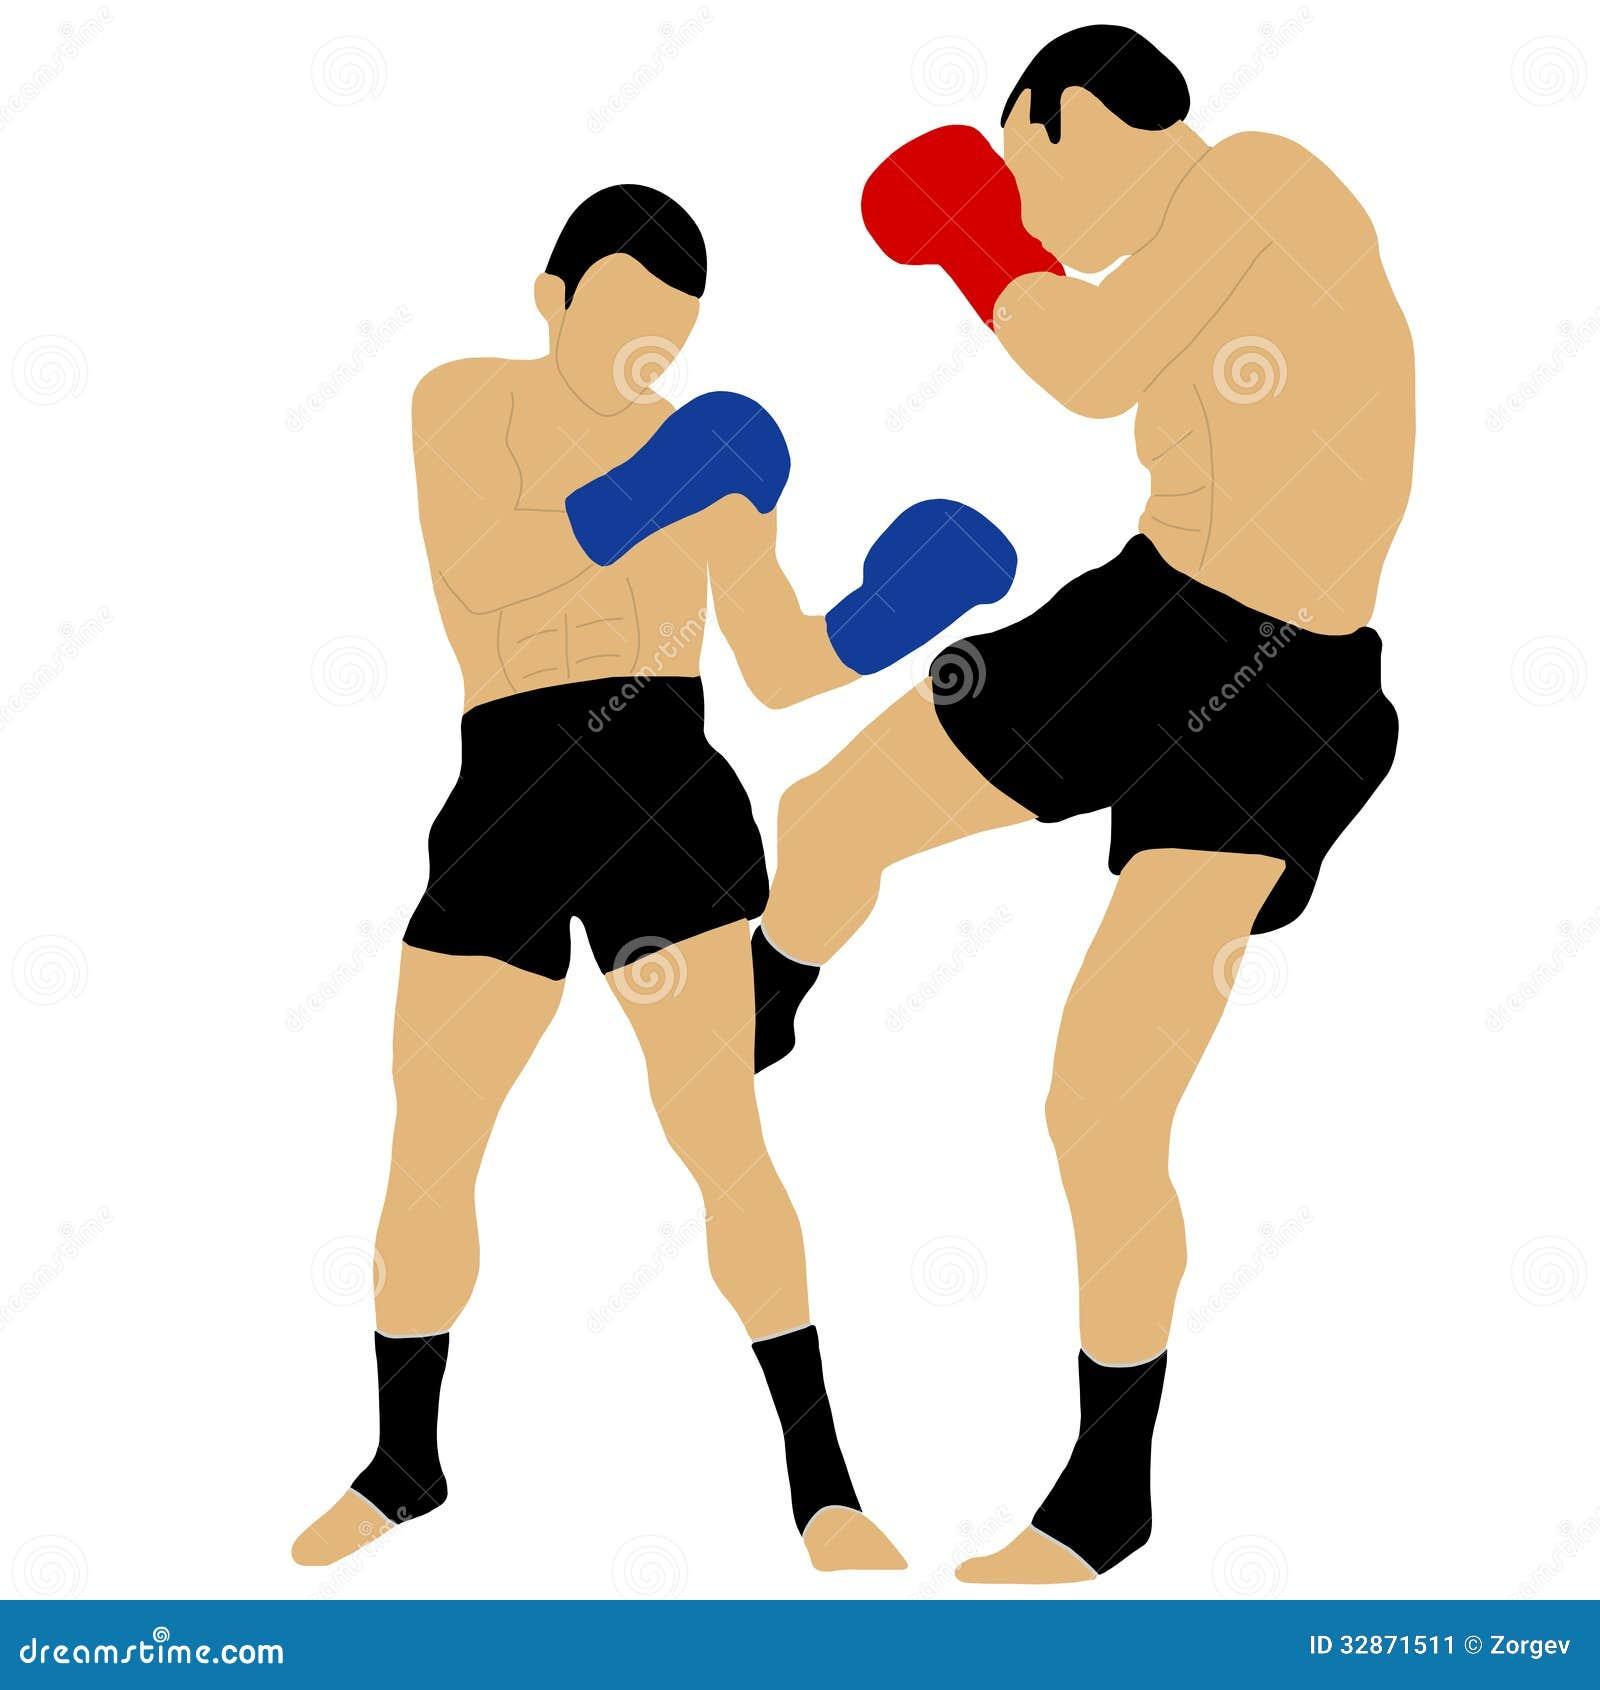 muay thai punch